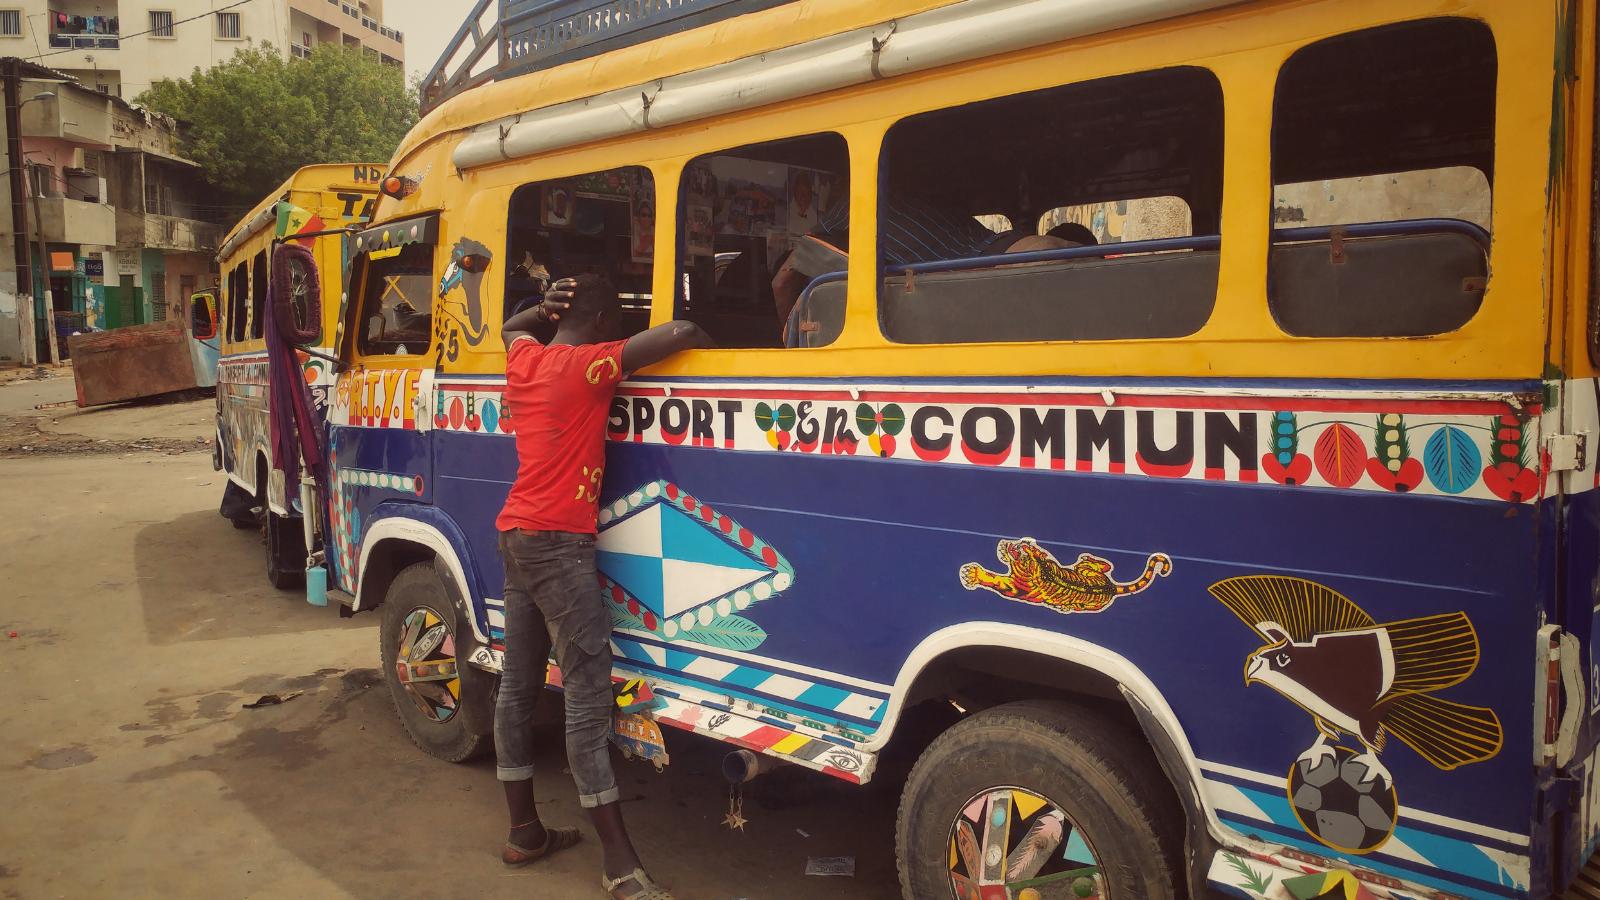 Traffic bus in Africa